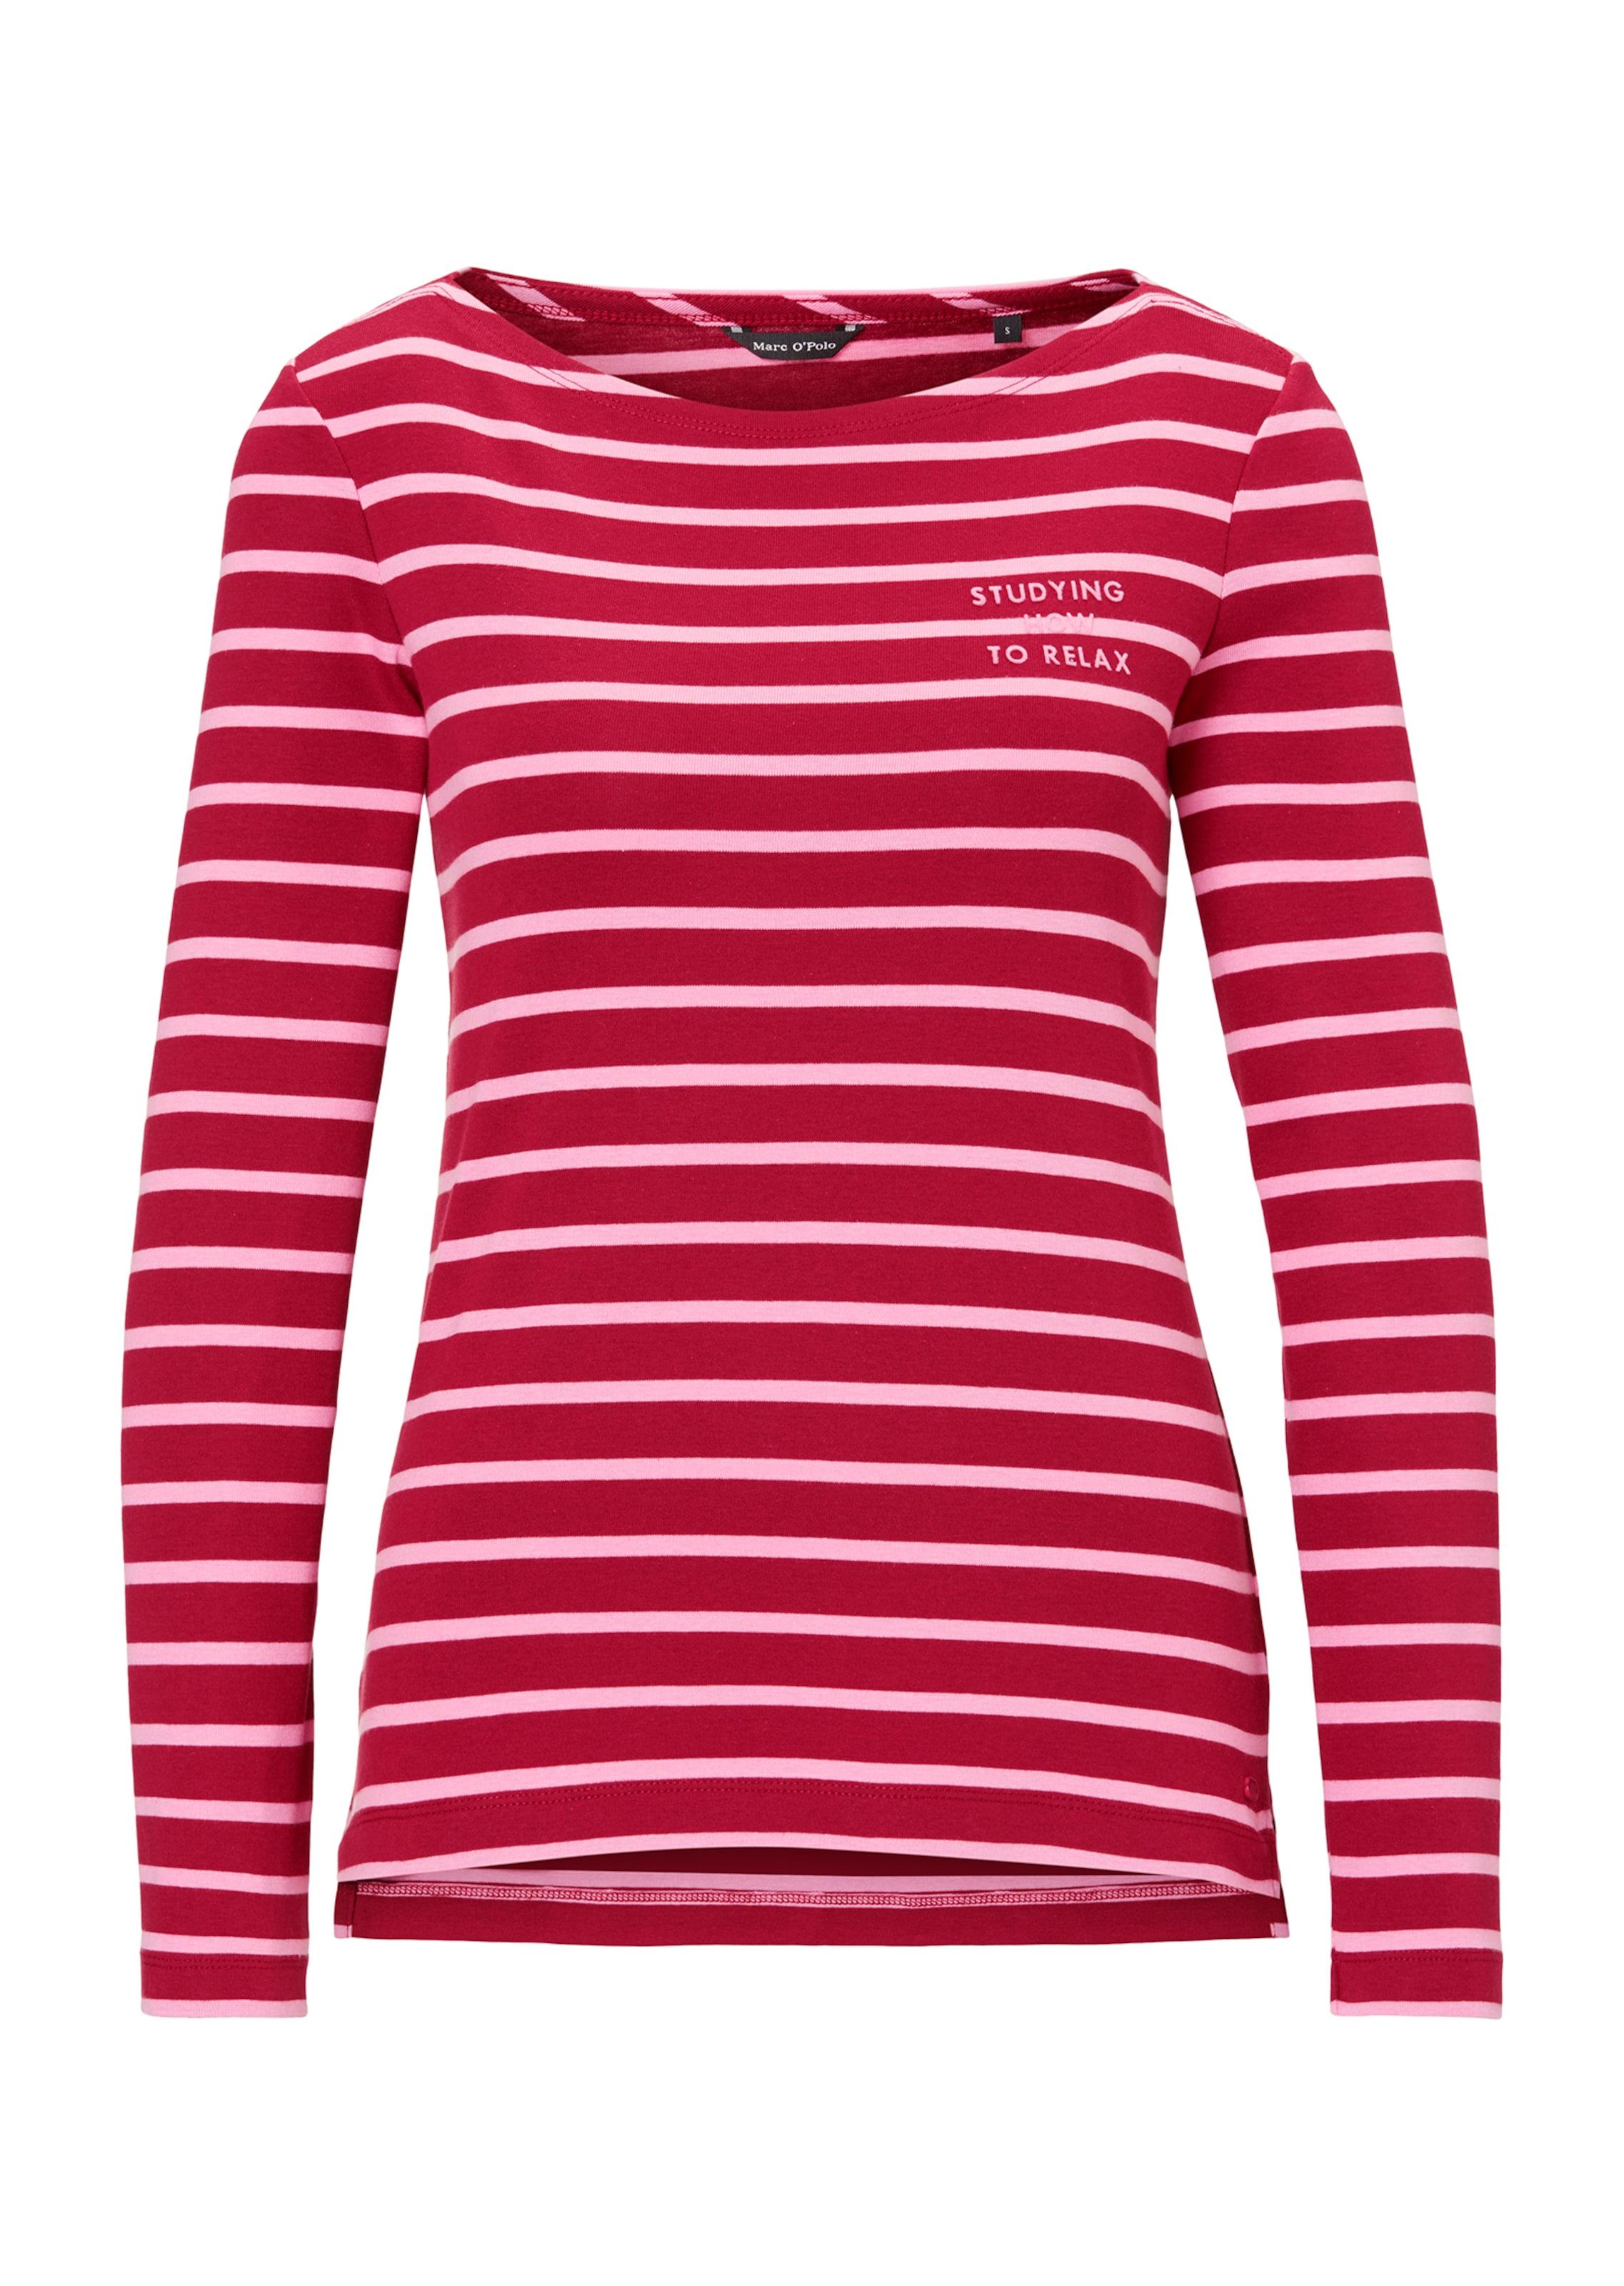 Damen Marc O'Polo Shirt blau, rot,  weiß | 07325864485415